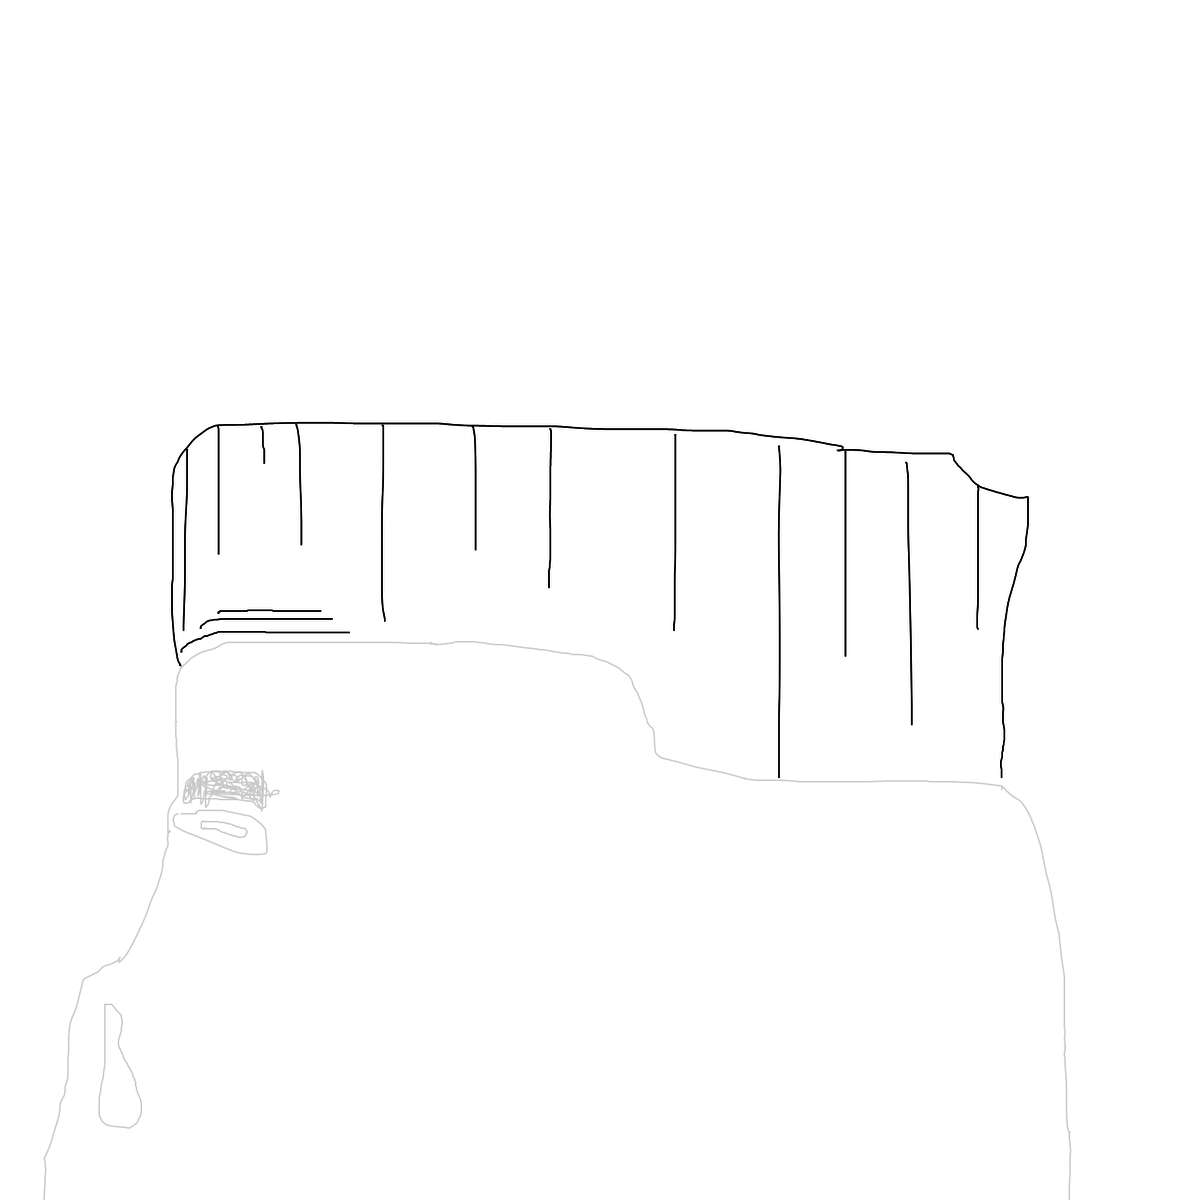 BAAAM drawing#23732 lat:46.5347824096679700lng: 6.3308453559875490